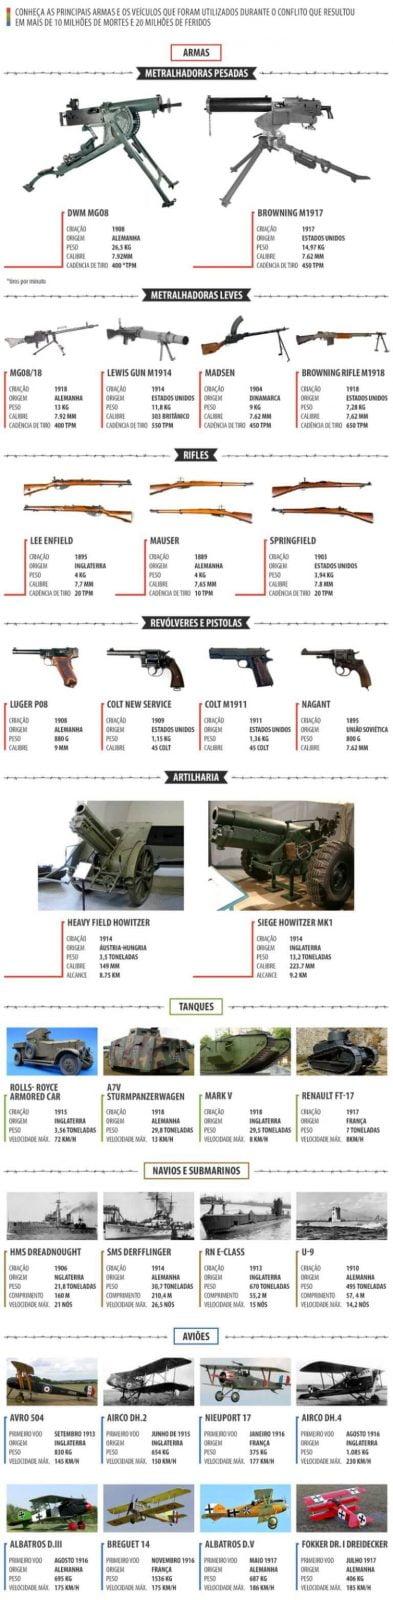 Principais armas utilizadas na Primeira Guerra Mundial